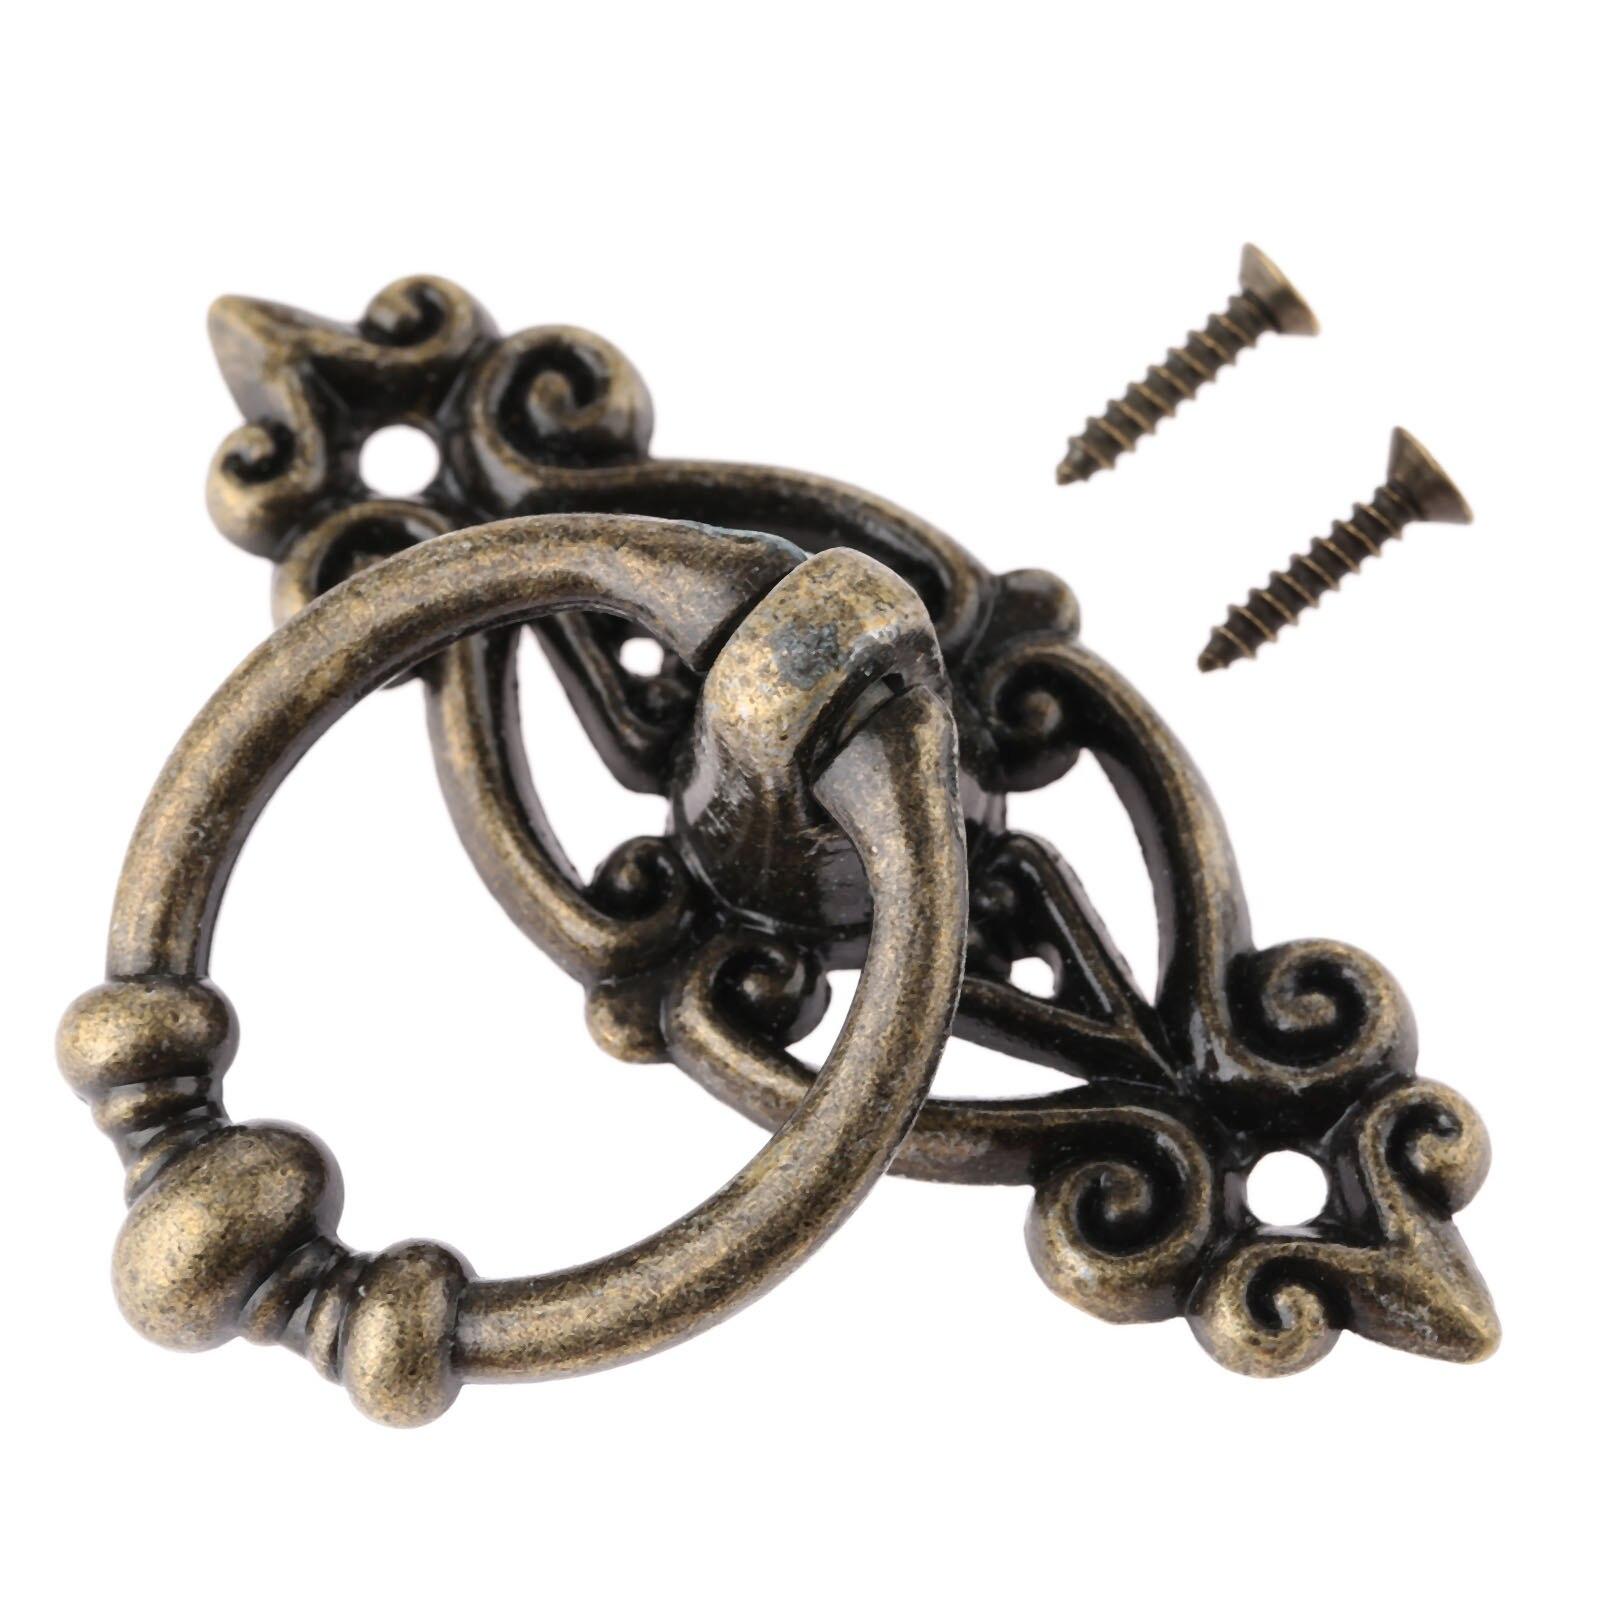 Antique furniture handle cabinet knobs and handles vintage for Furniture handles